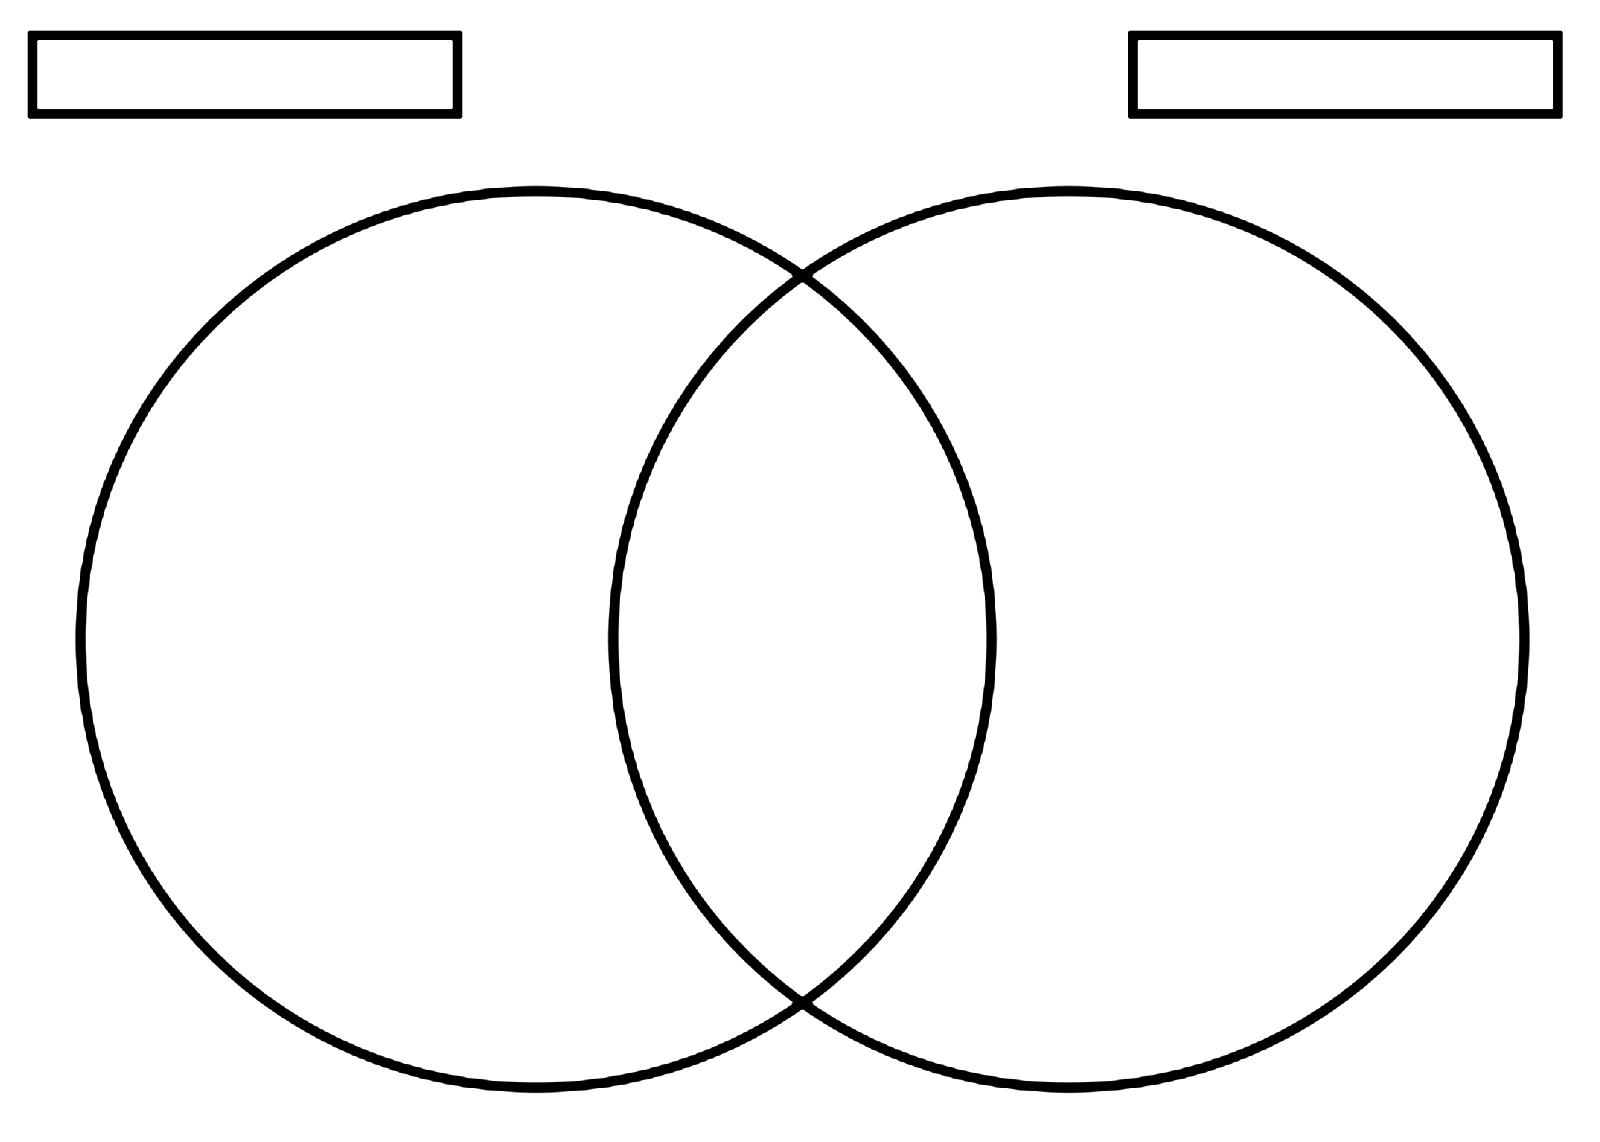 Venn diagram template 40 free venn diagram templates word pdf venn diagram template 40 free venn diagram templates word pdf template ccuart Gallery